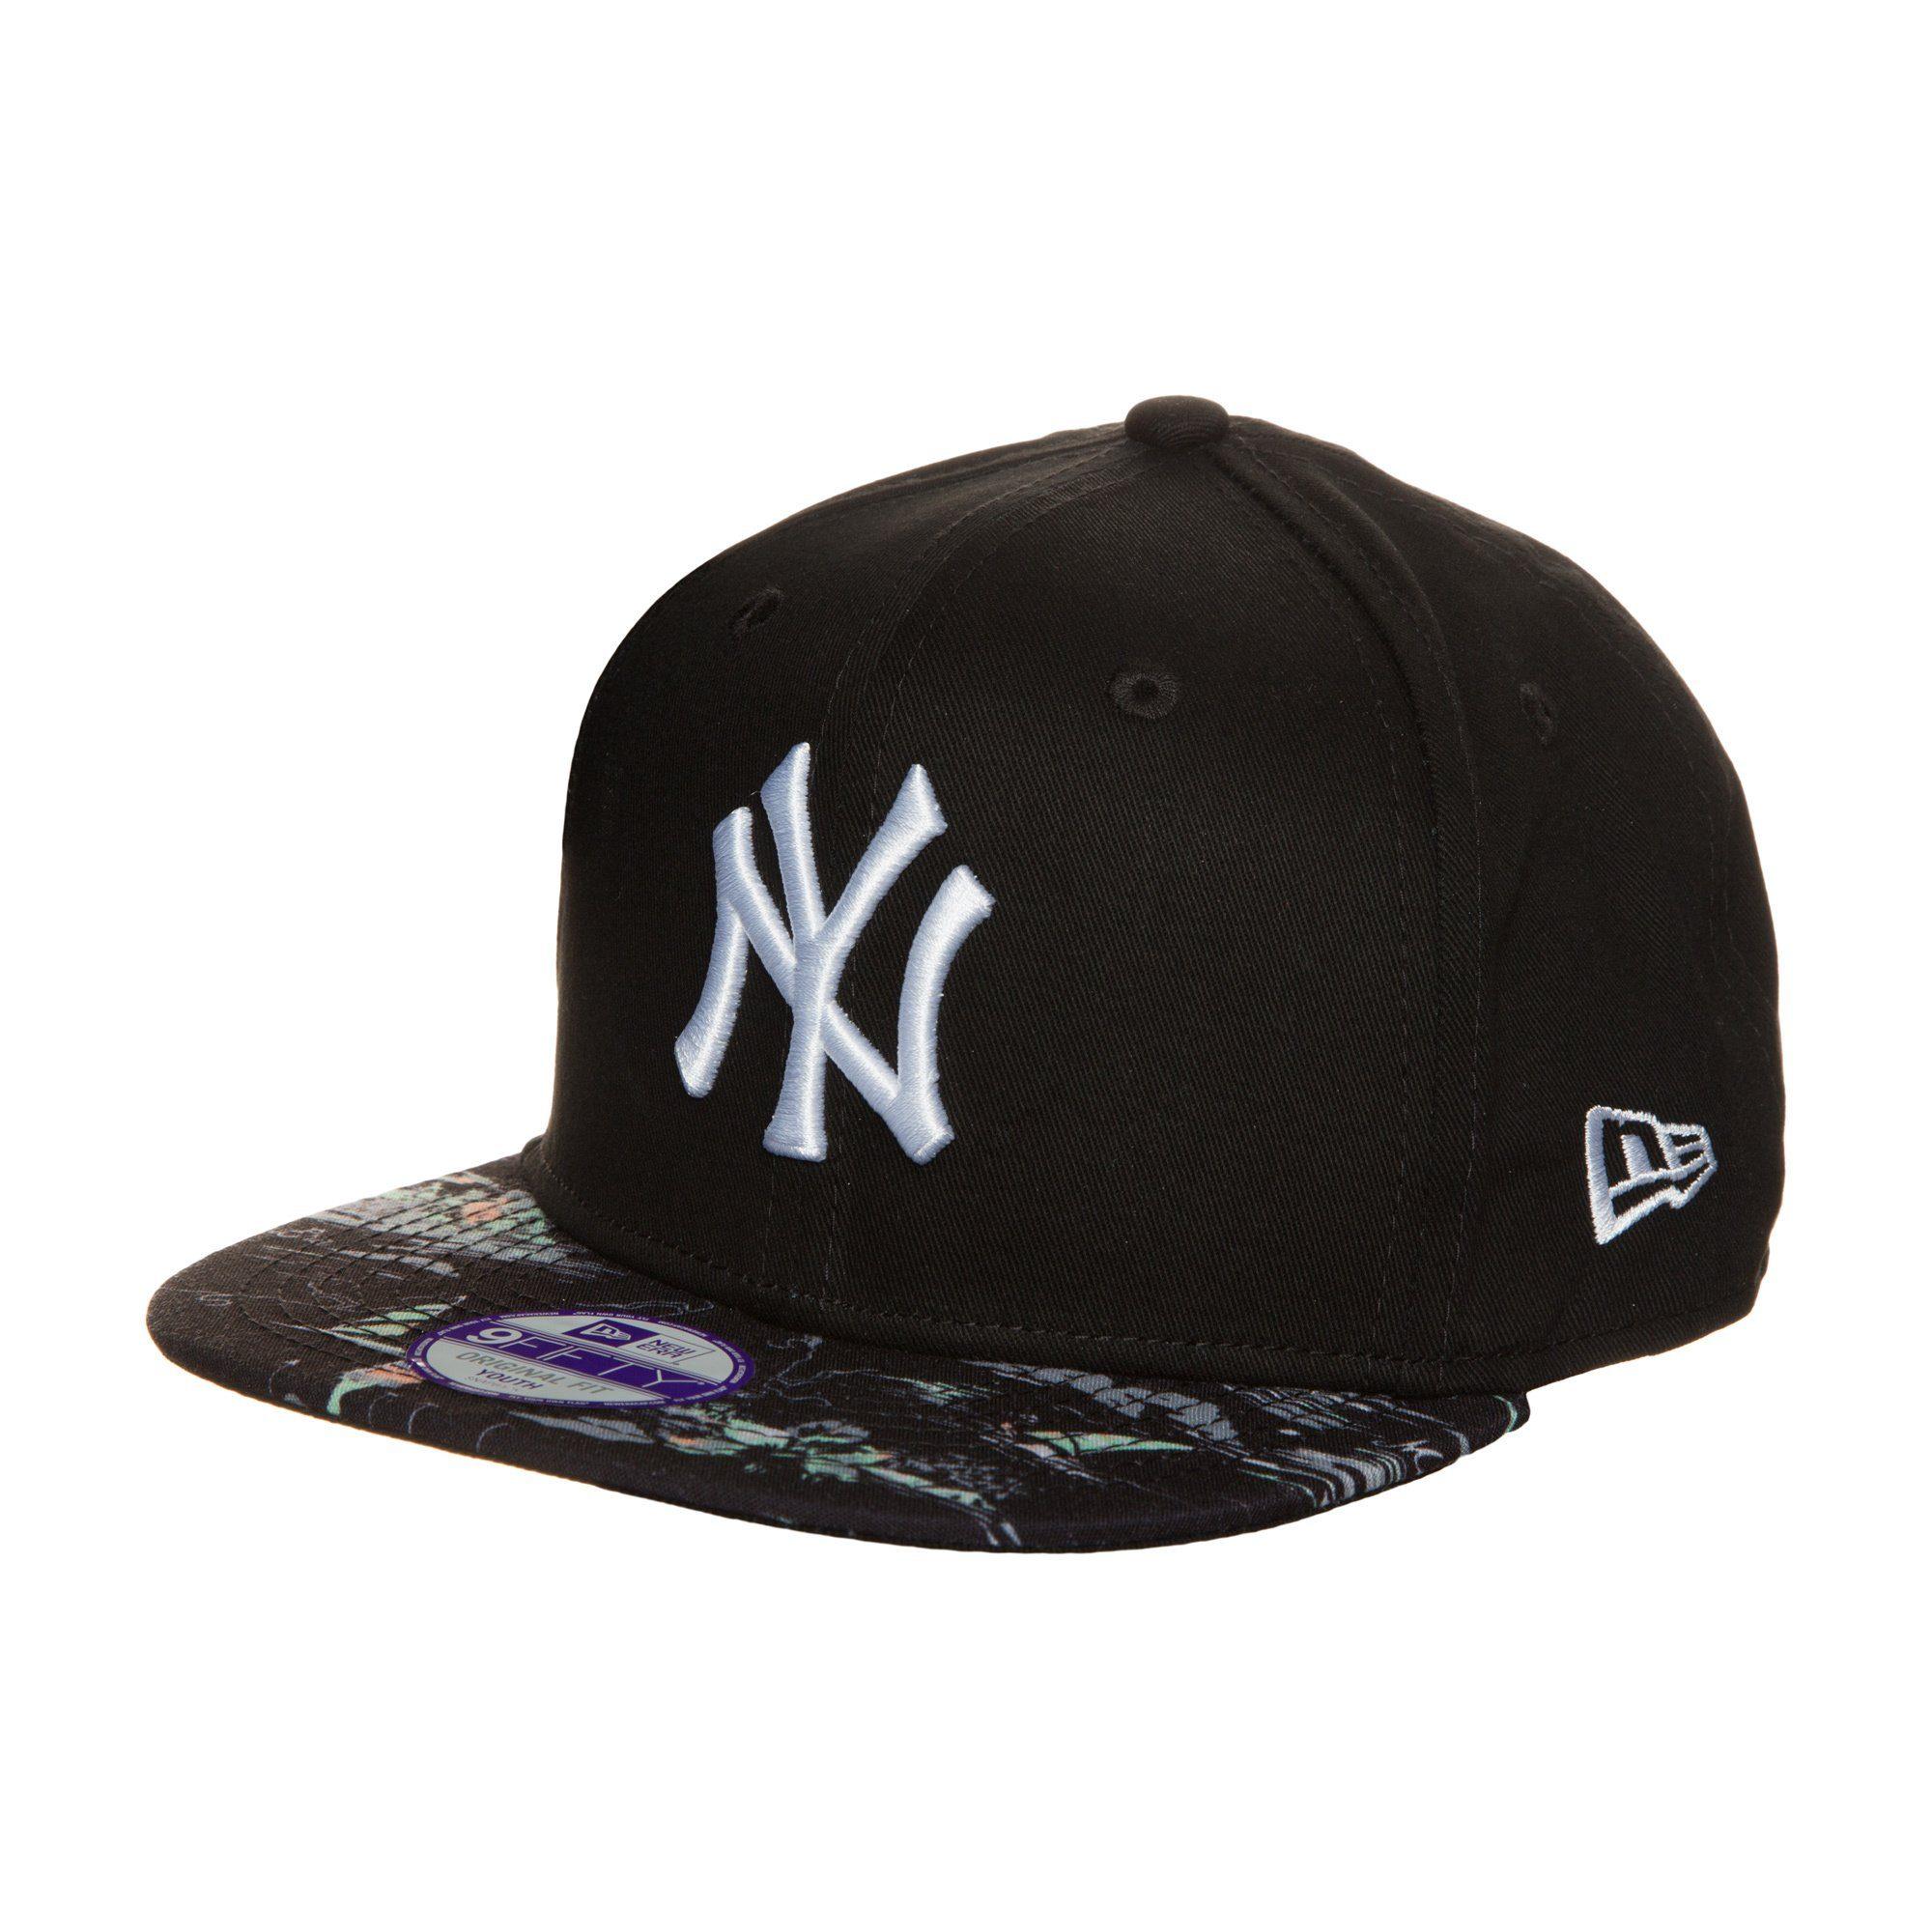 New Era 9FIFTY MLB New York Yankees Snapback Cap Kinder